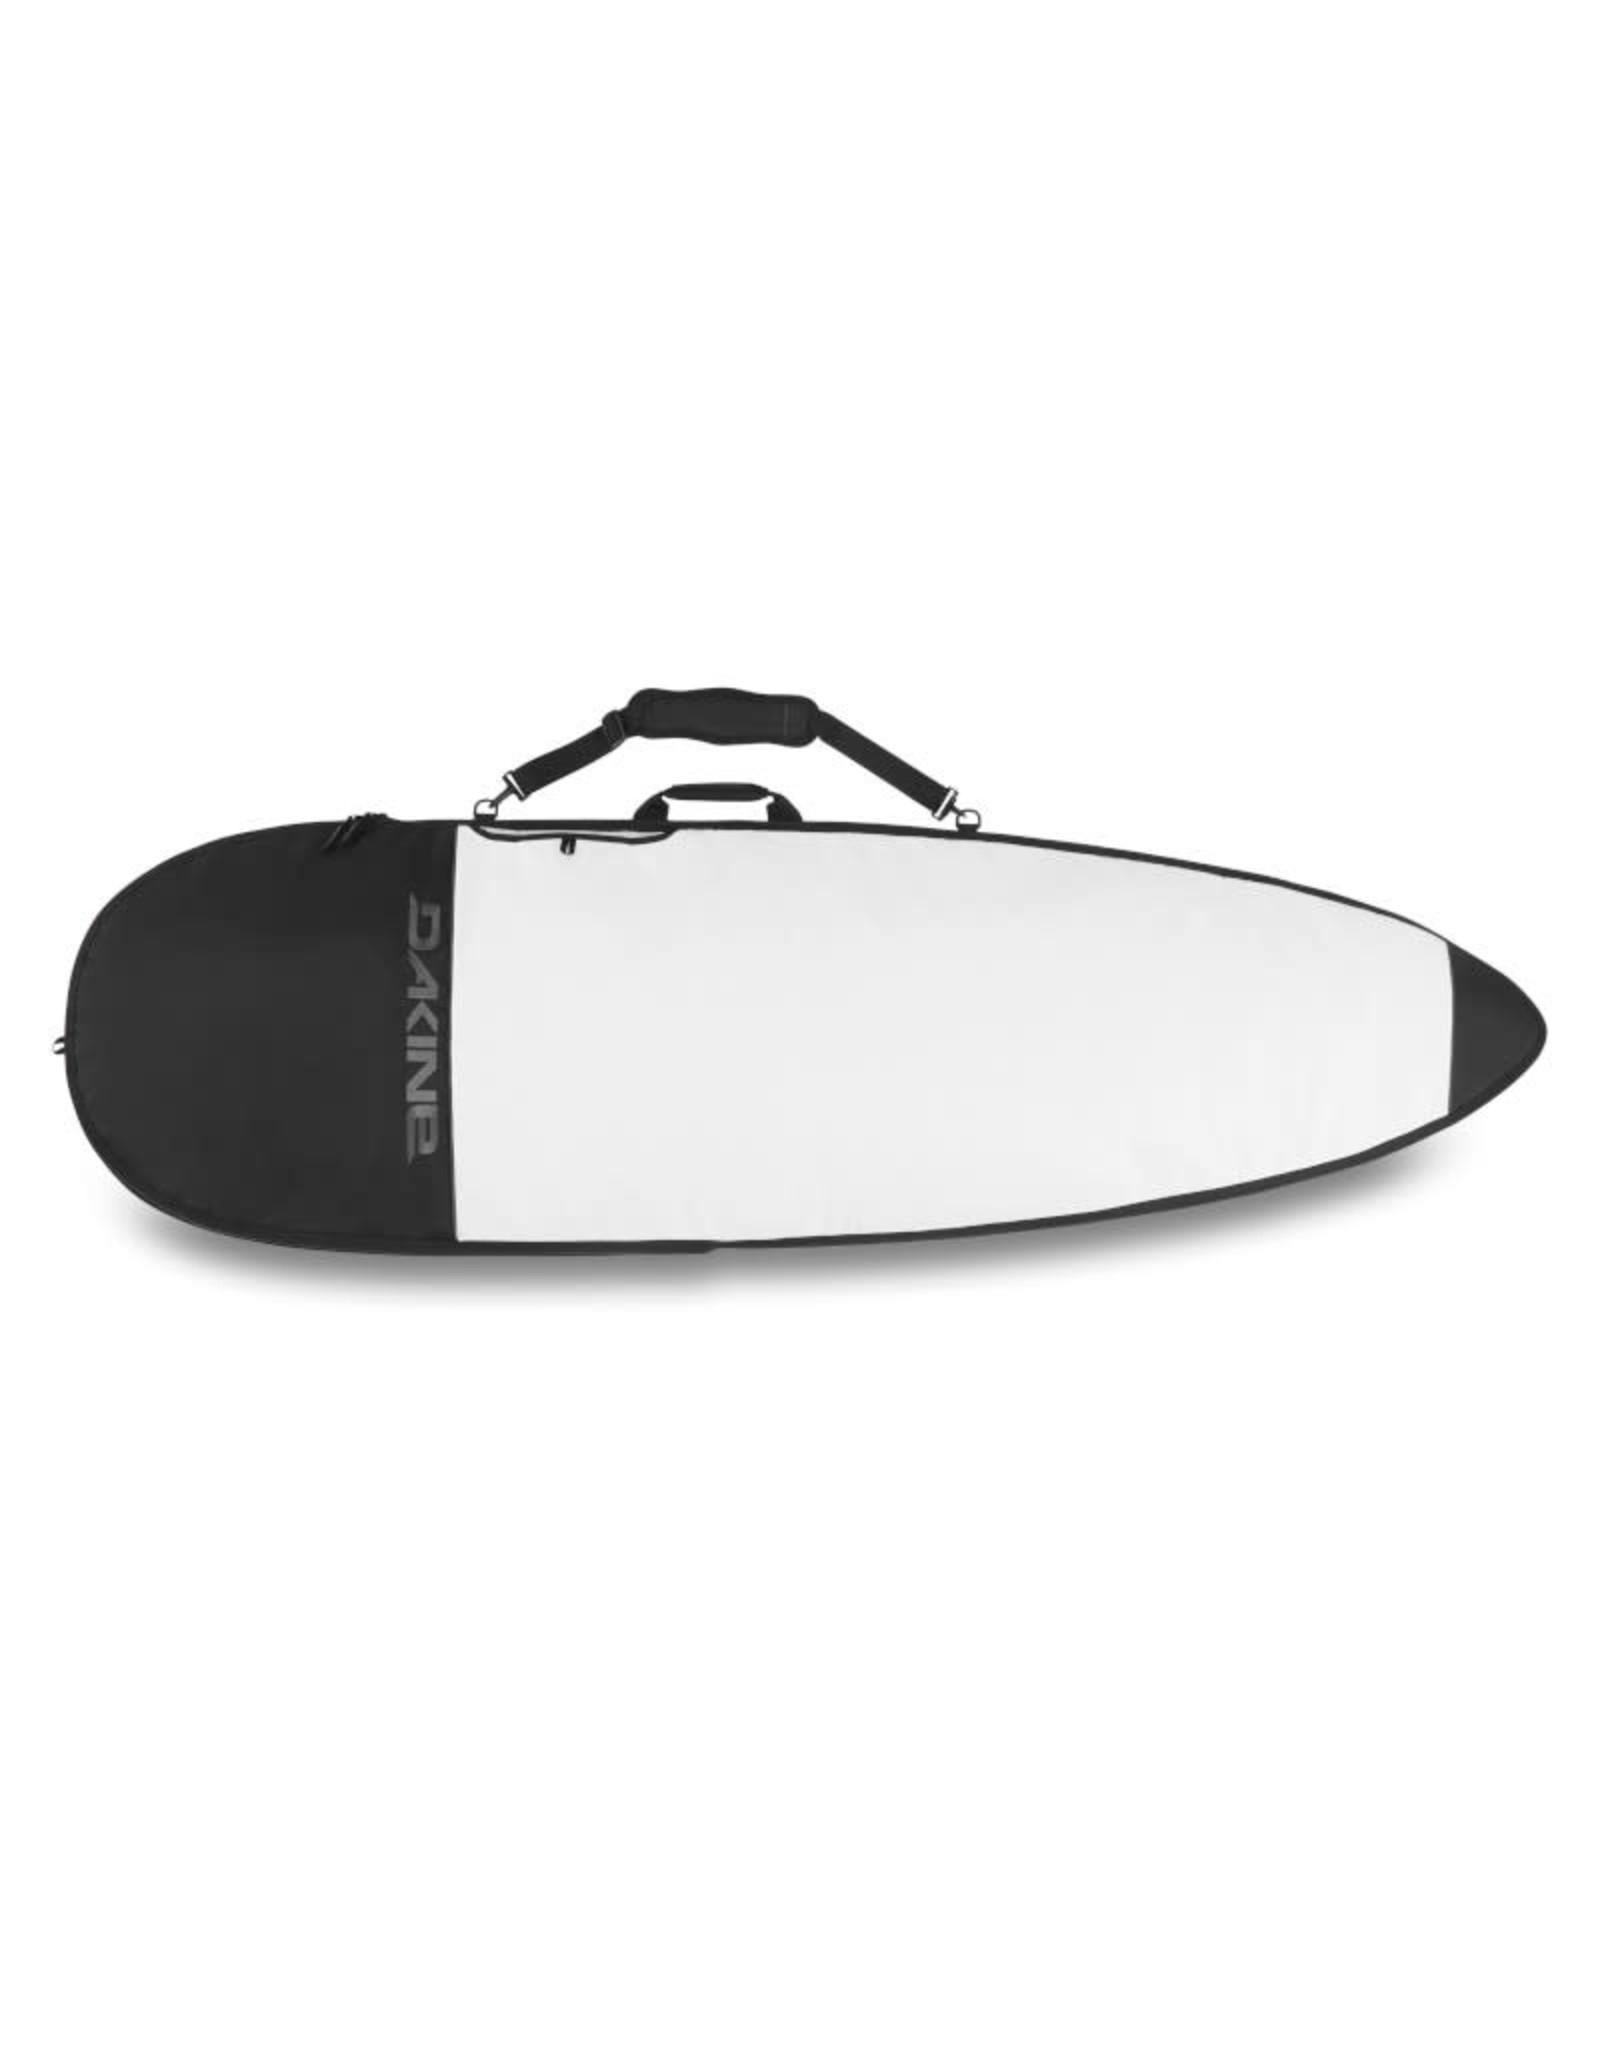 "Dakine Dakine 5'4"" Daylight Truster Surfboard Bag White"